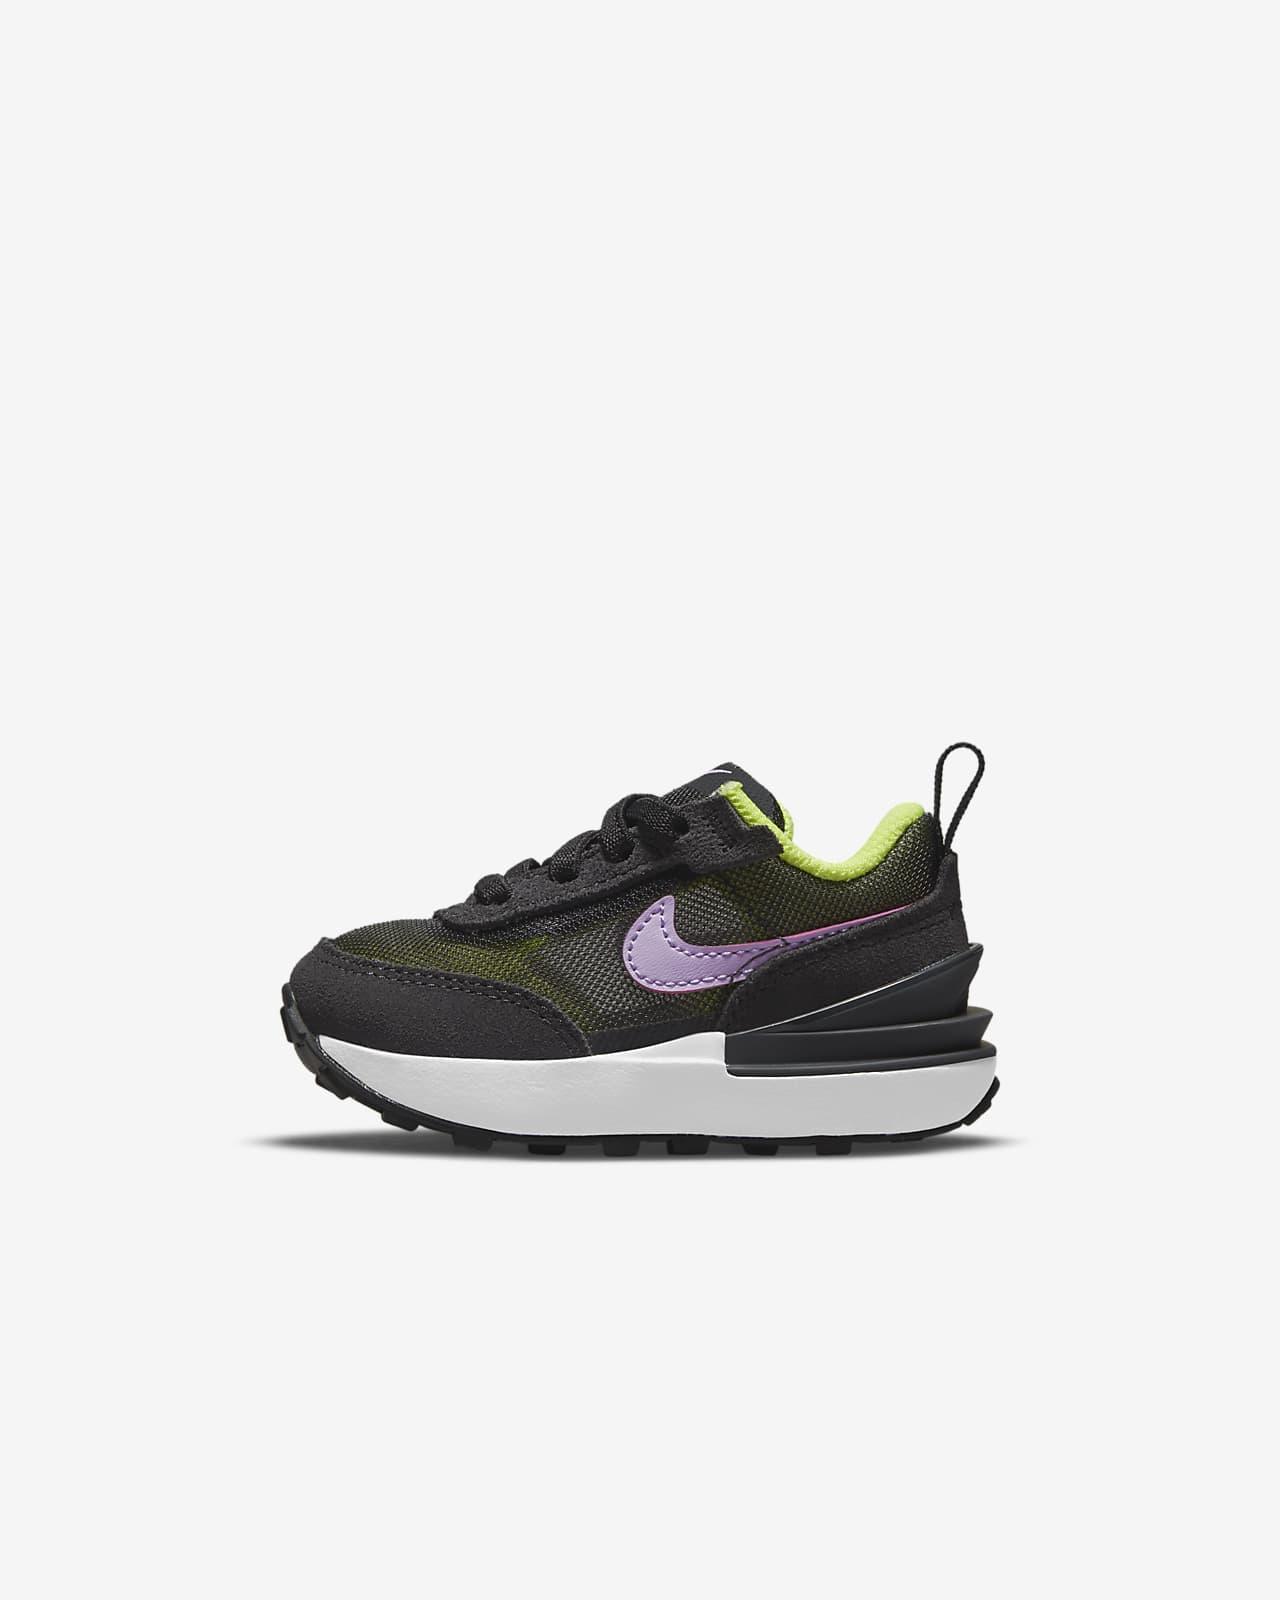 Nike Waffle One Baby/Toddler Shoes